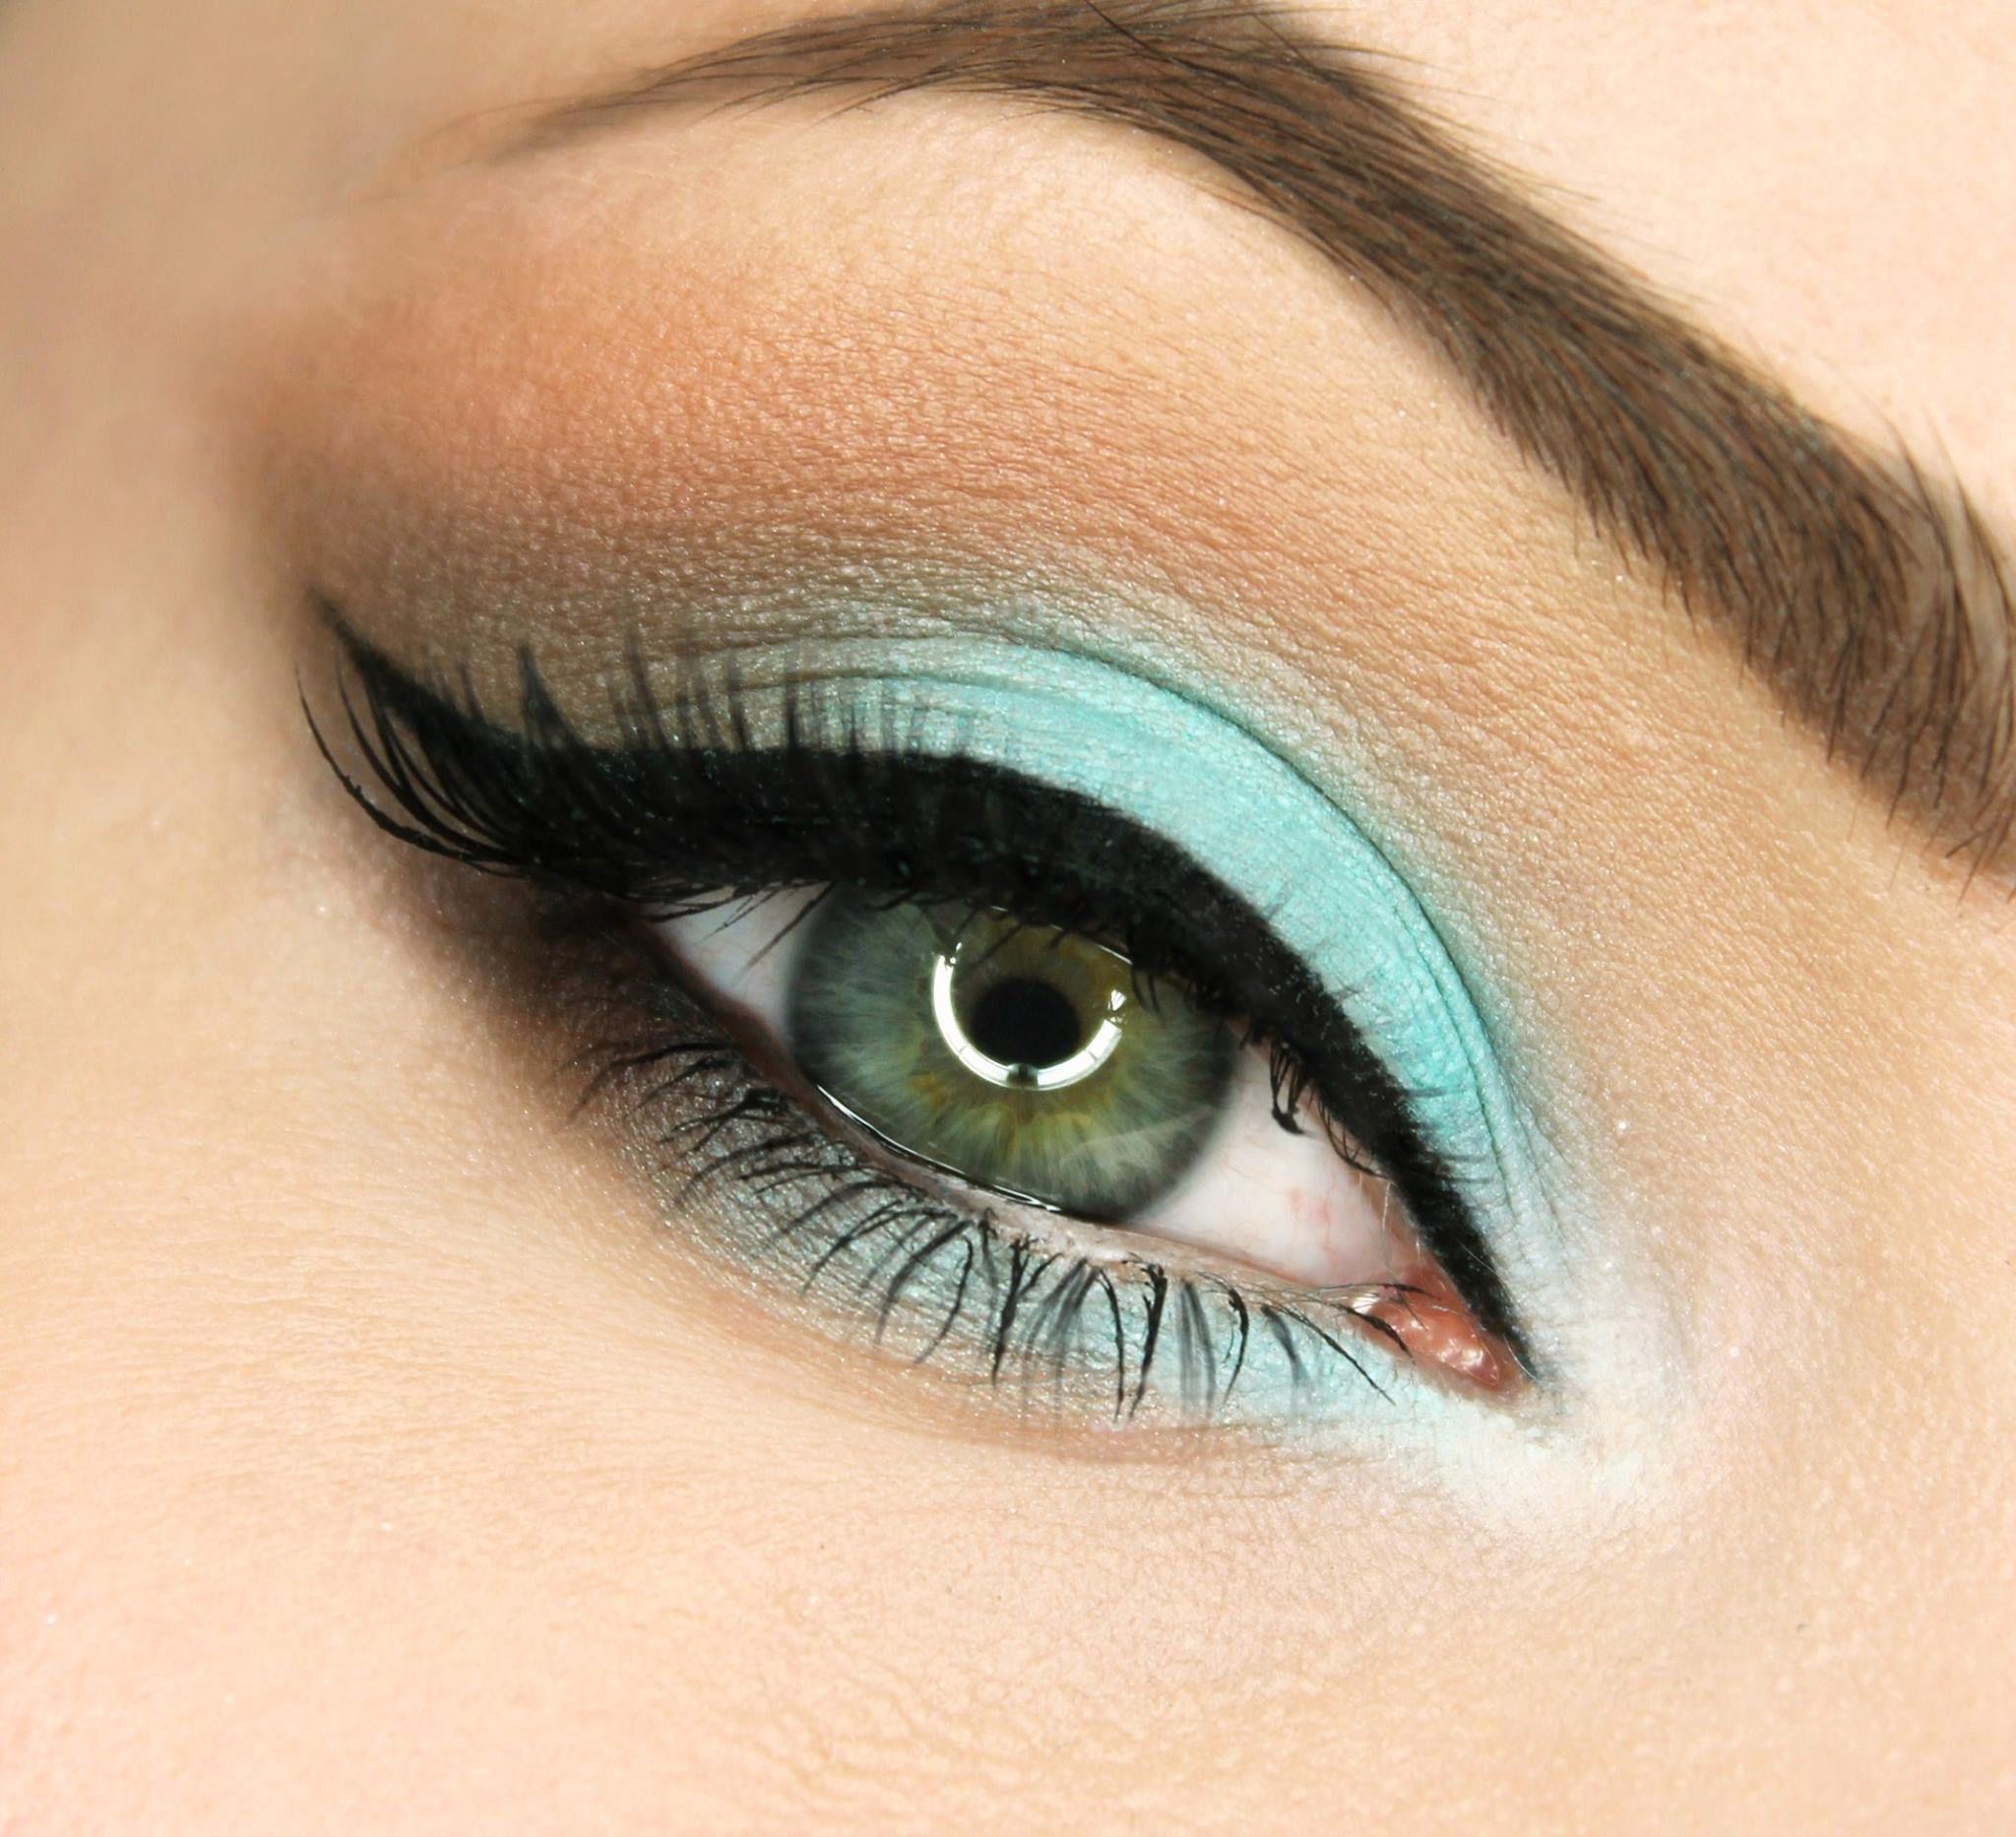 MAKEUP ☯★☮ Makeup for green eyes, Makeup looks for green